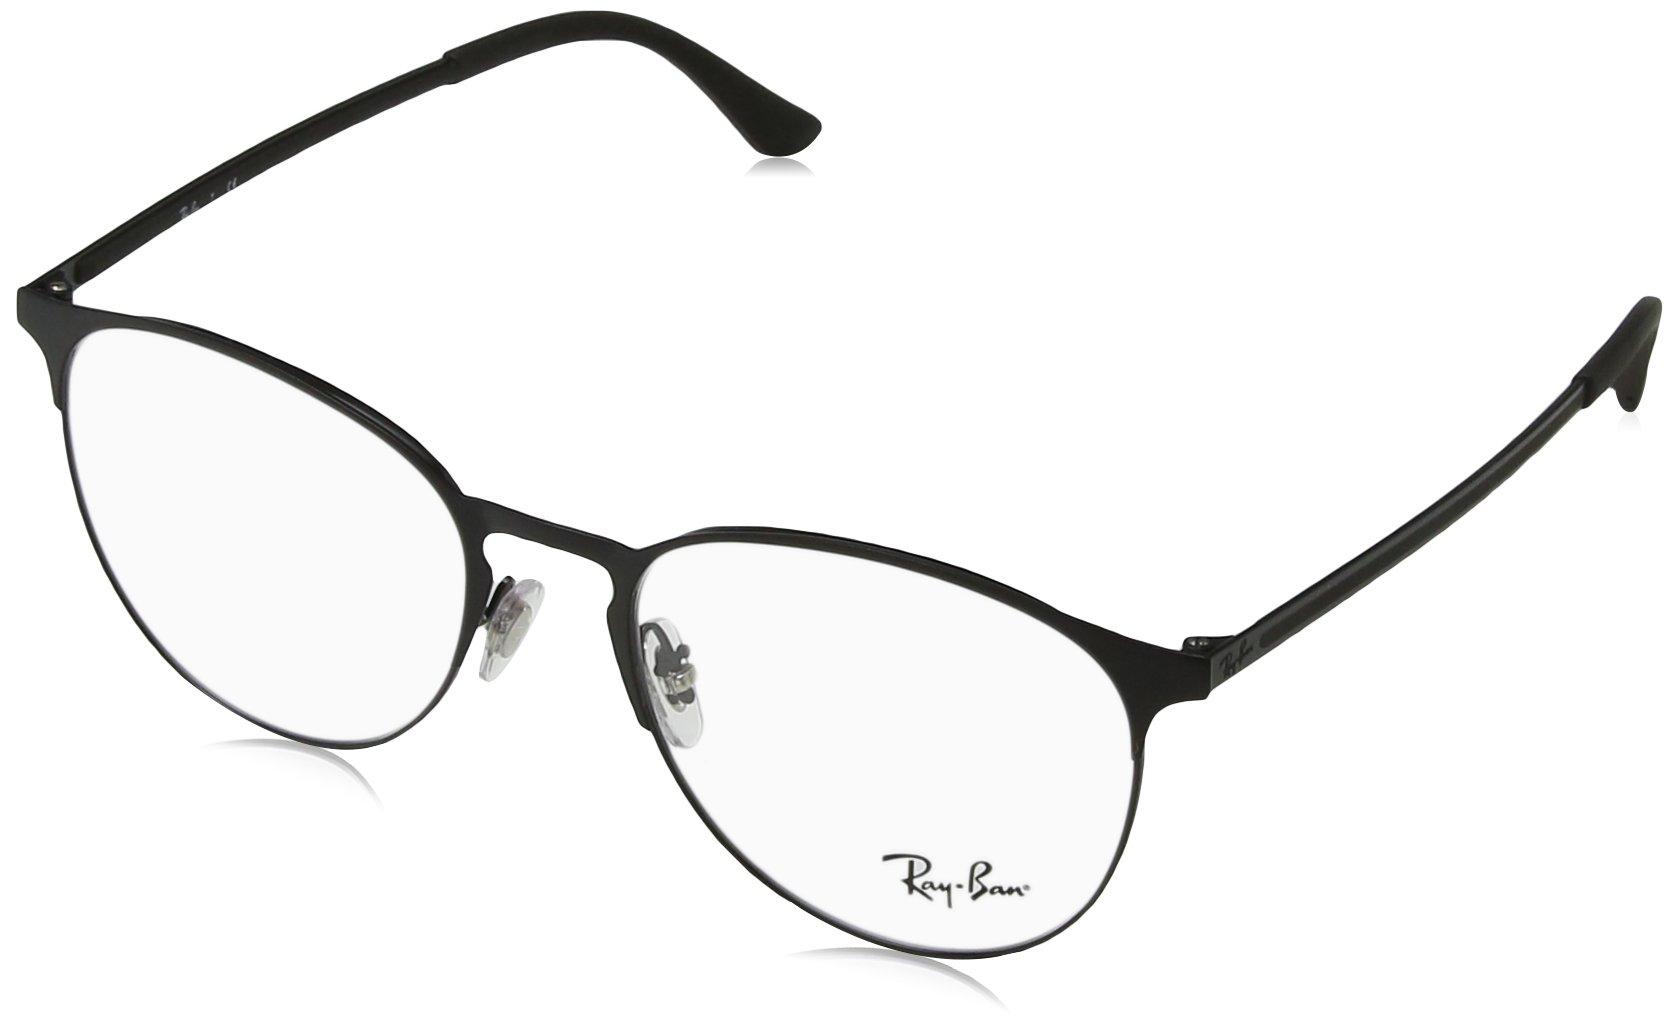 Ray-Ban RX6375 Round Metal Eyeglass Frames, Black On Matte Black/Demo Lens, 53 mm